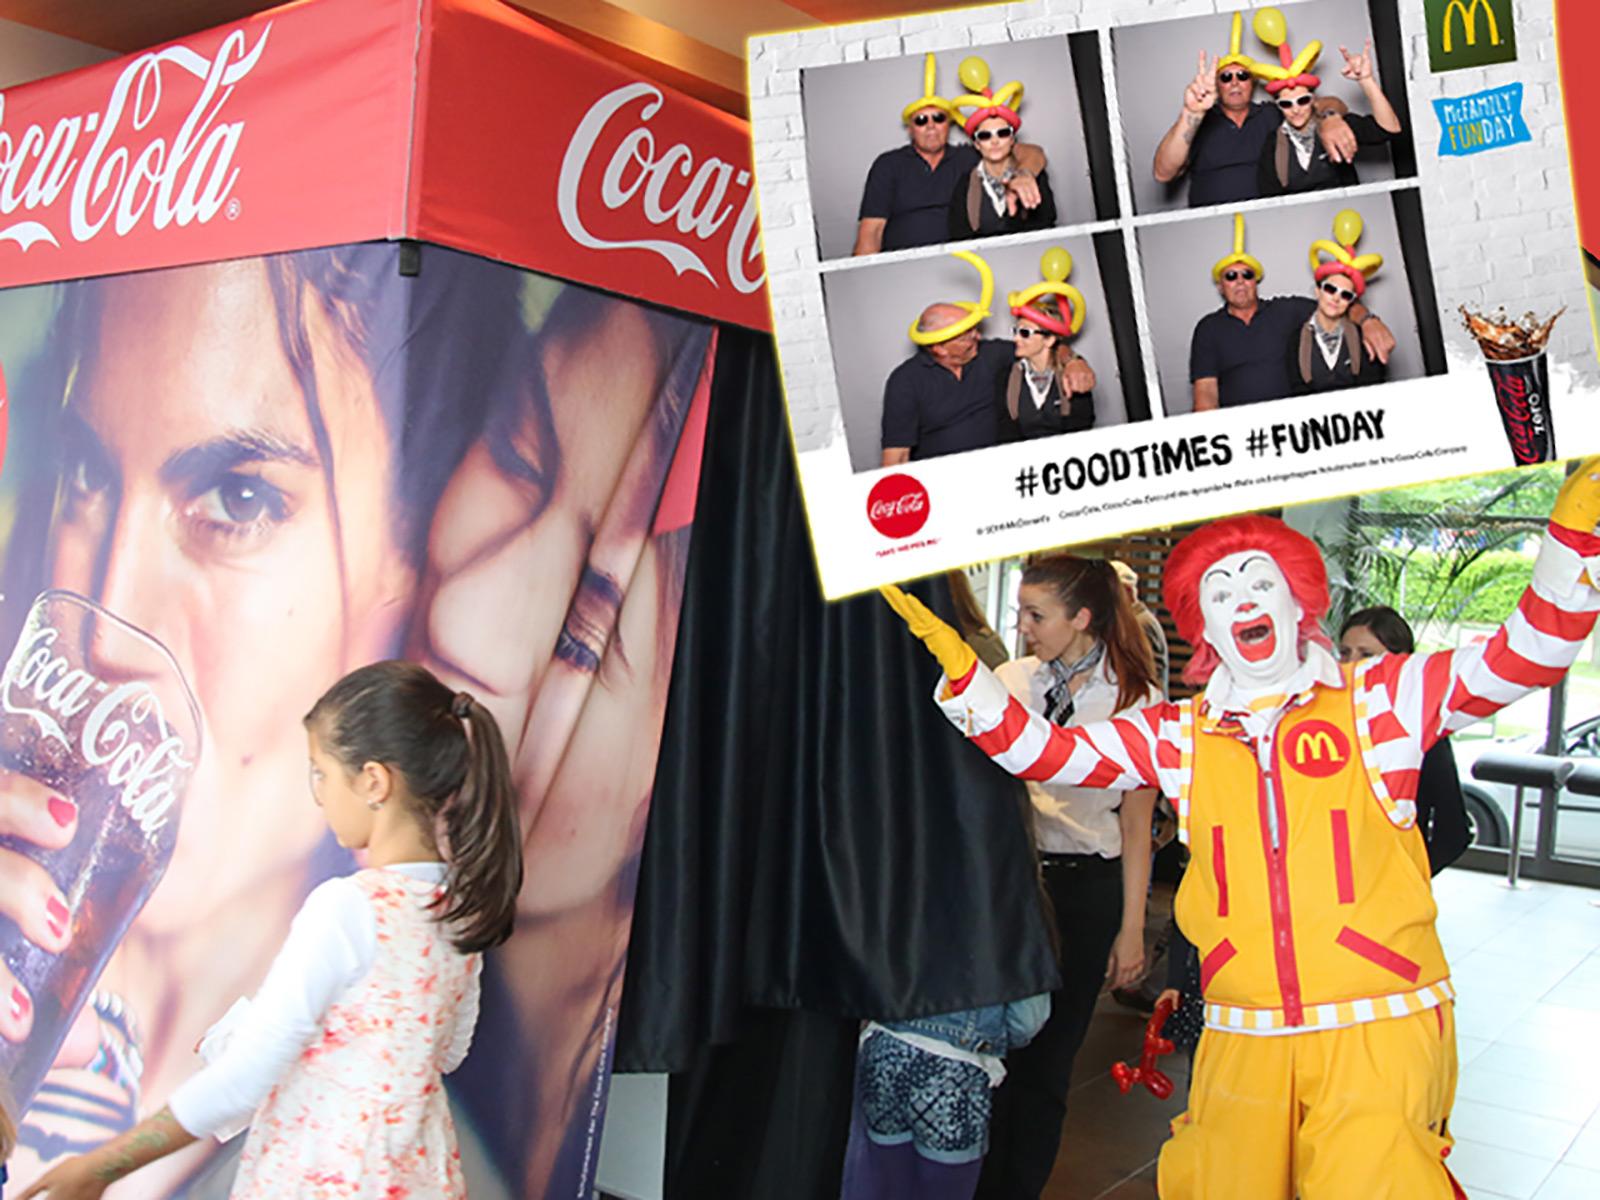 Fotobox mieten McDonalds McFamily FunDay